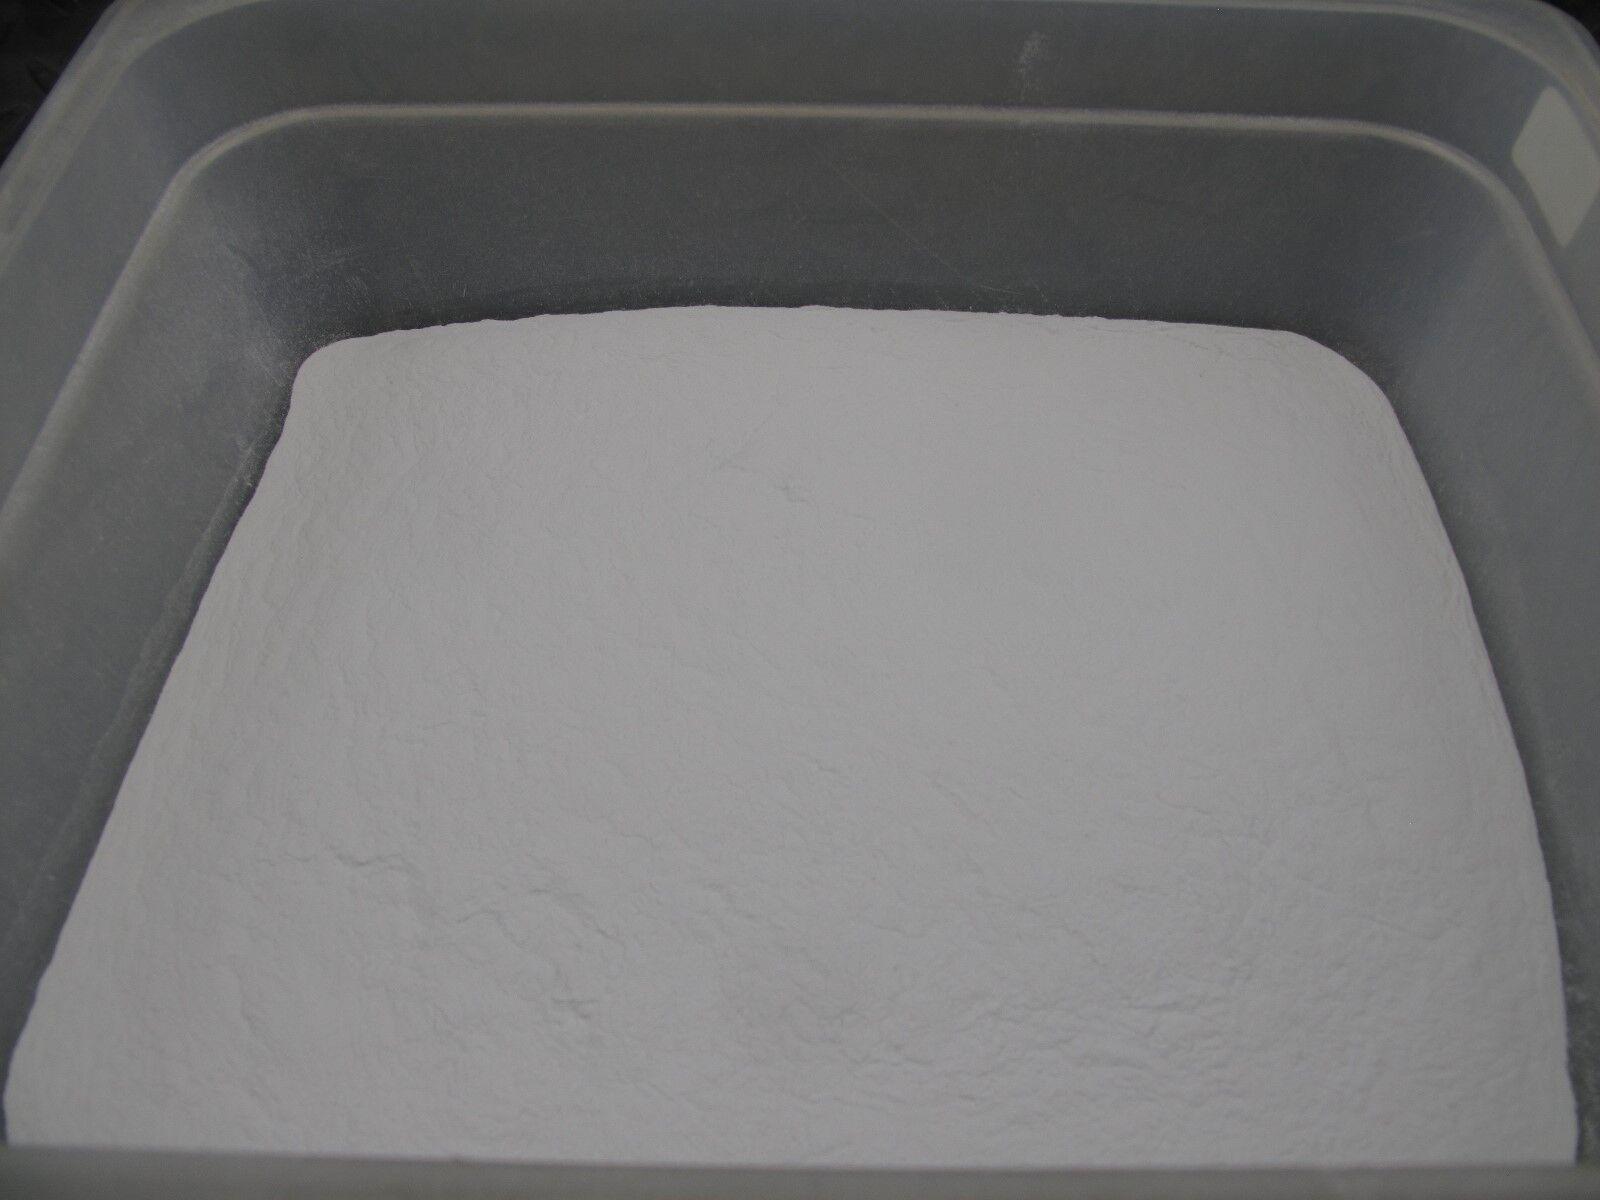 White Aluminum Oxide - 220 GRIT - (VERY FINE)  Sand Blasting Abrasive - 40 LBS